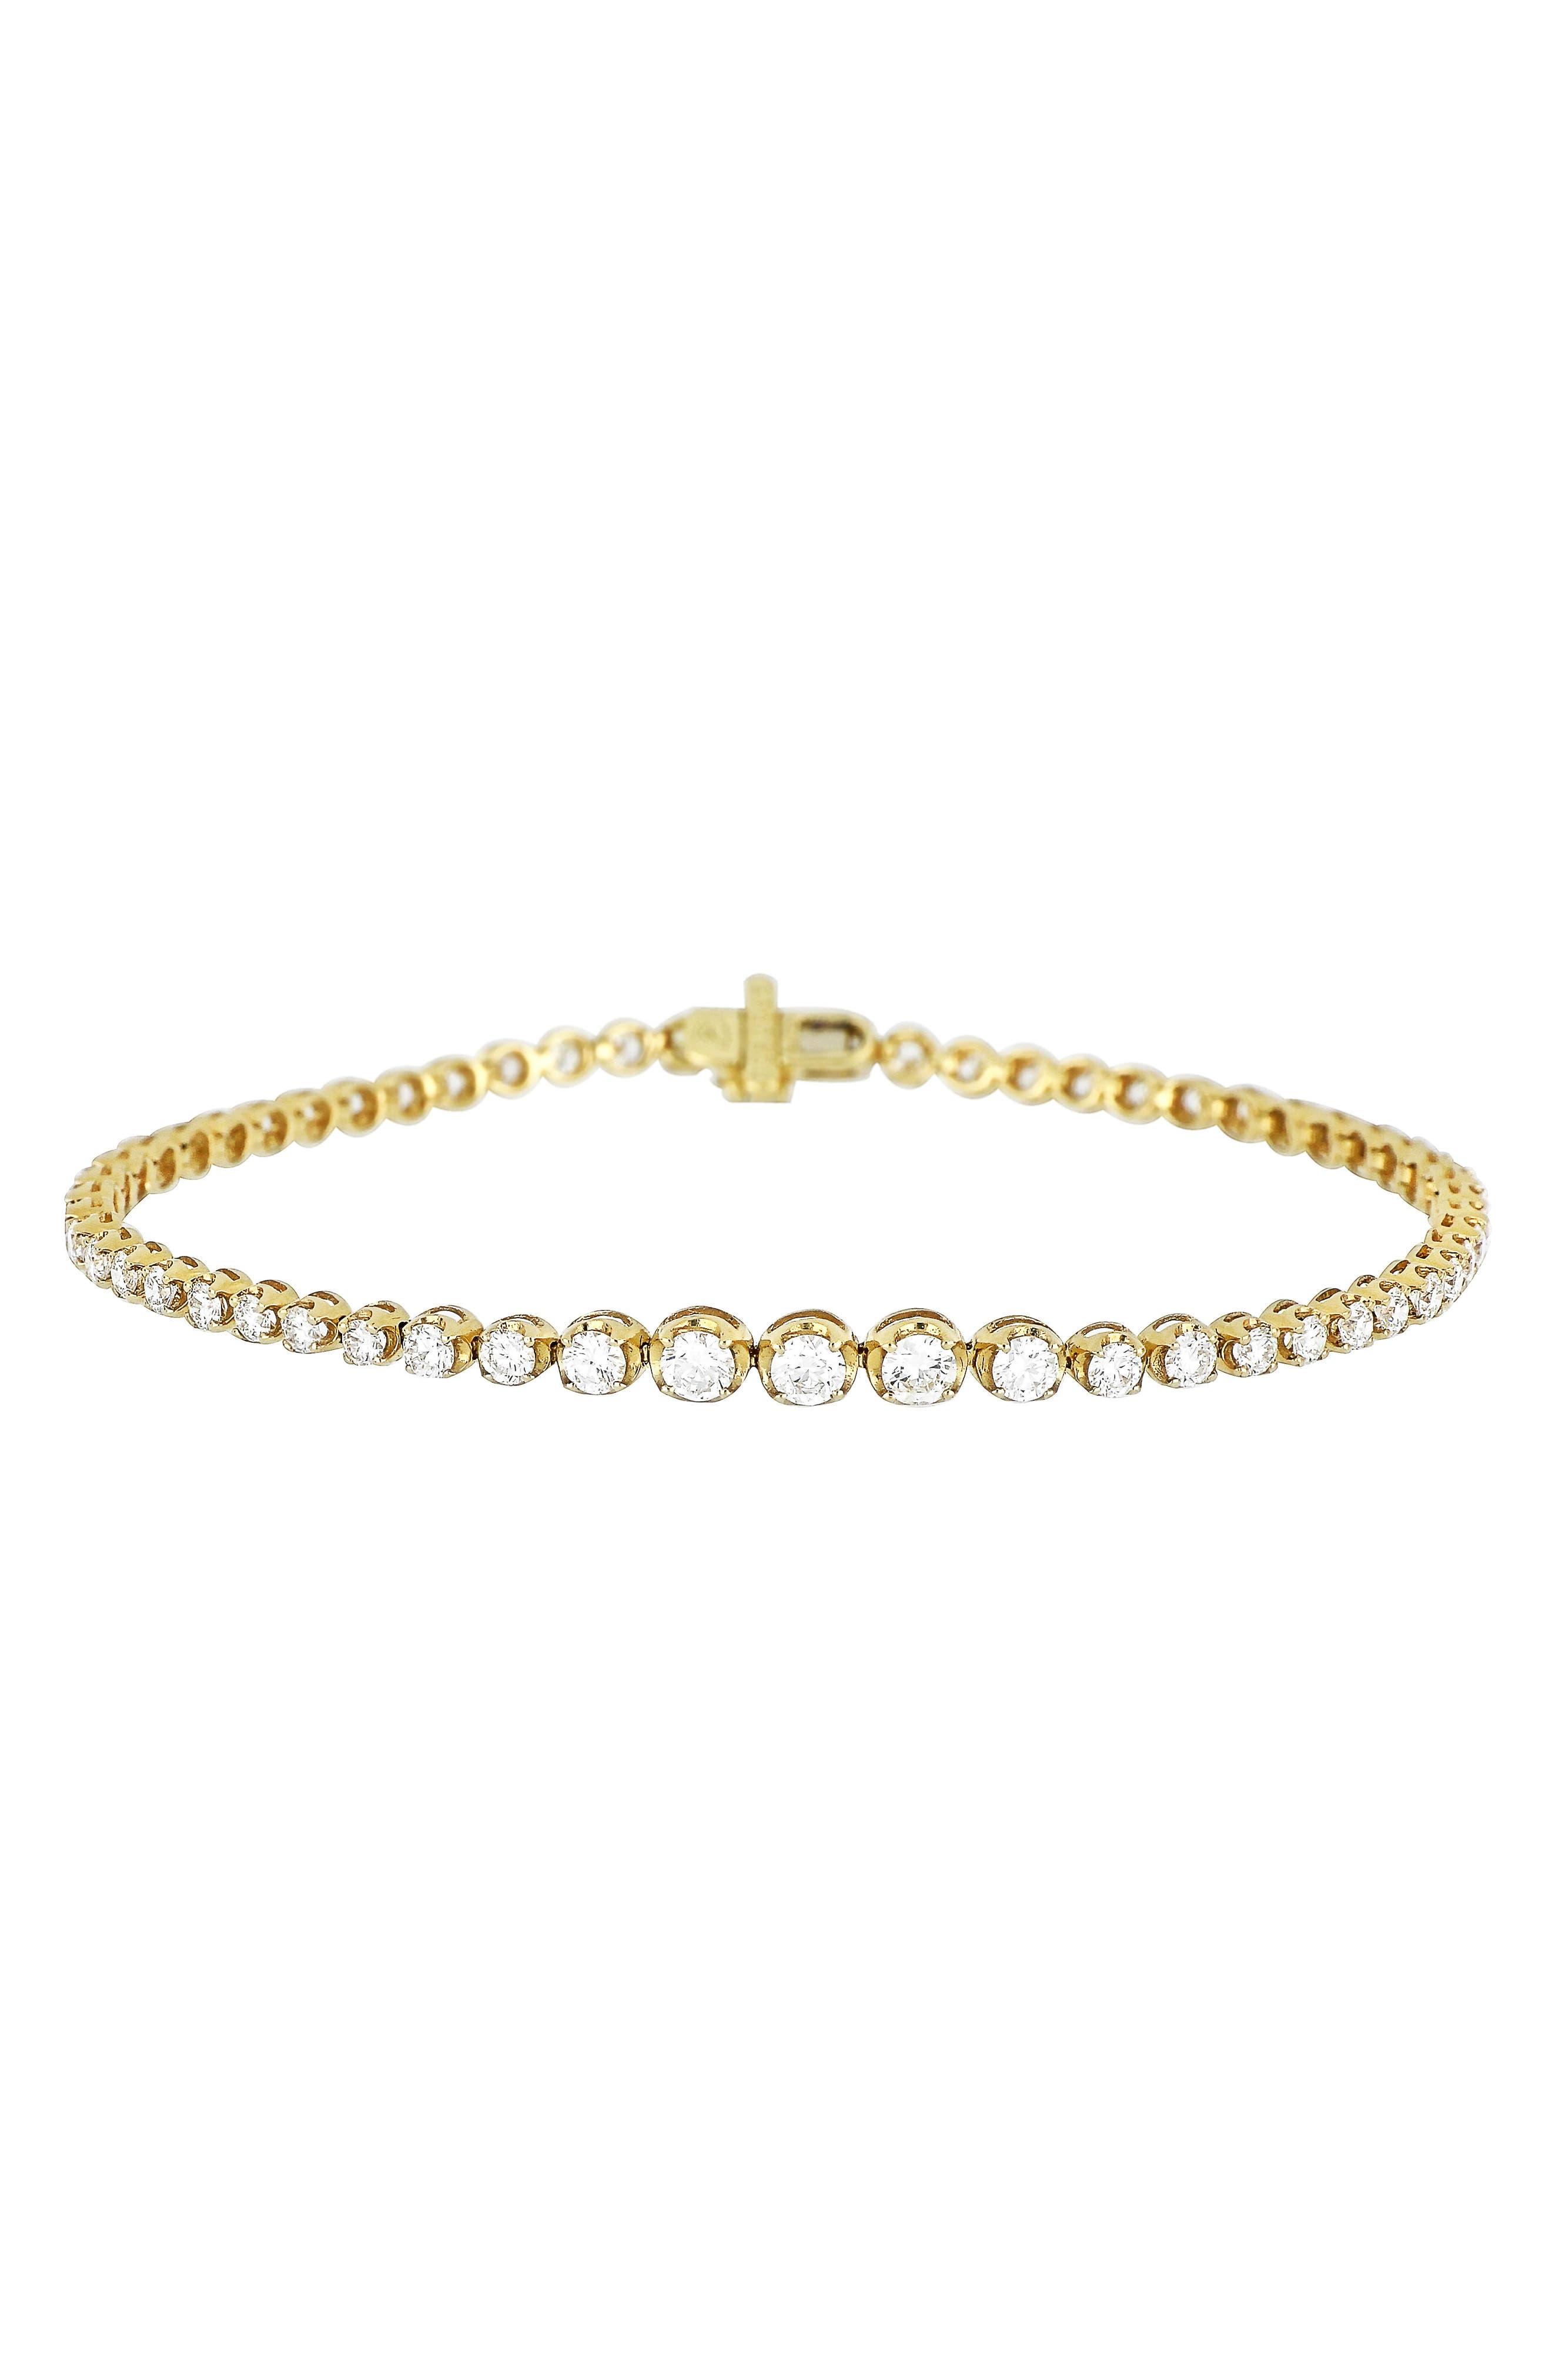 Diamond Tennis Bracelet,                             Main thumbnail 1, color,                             701